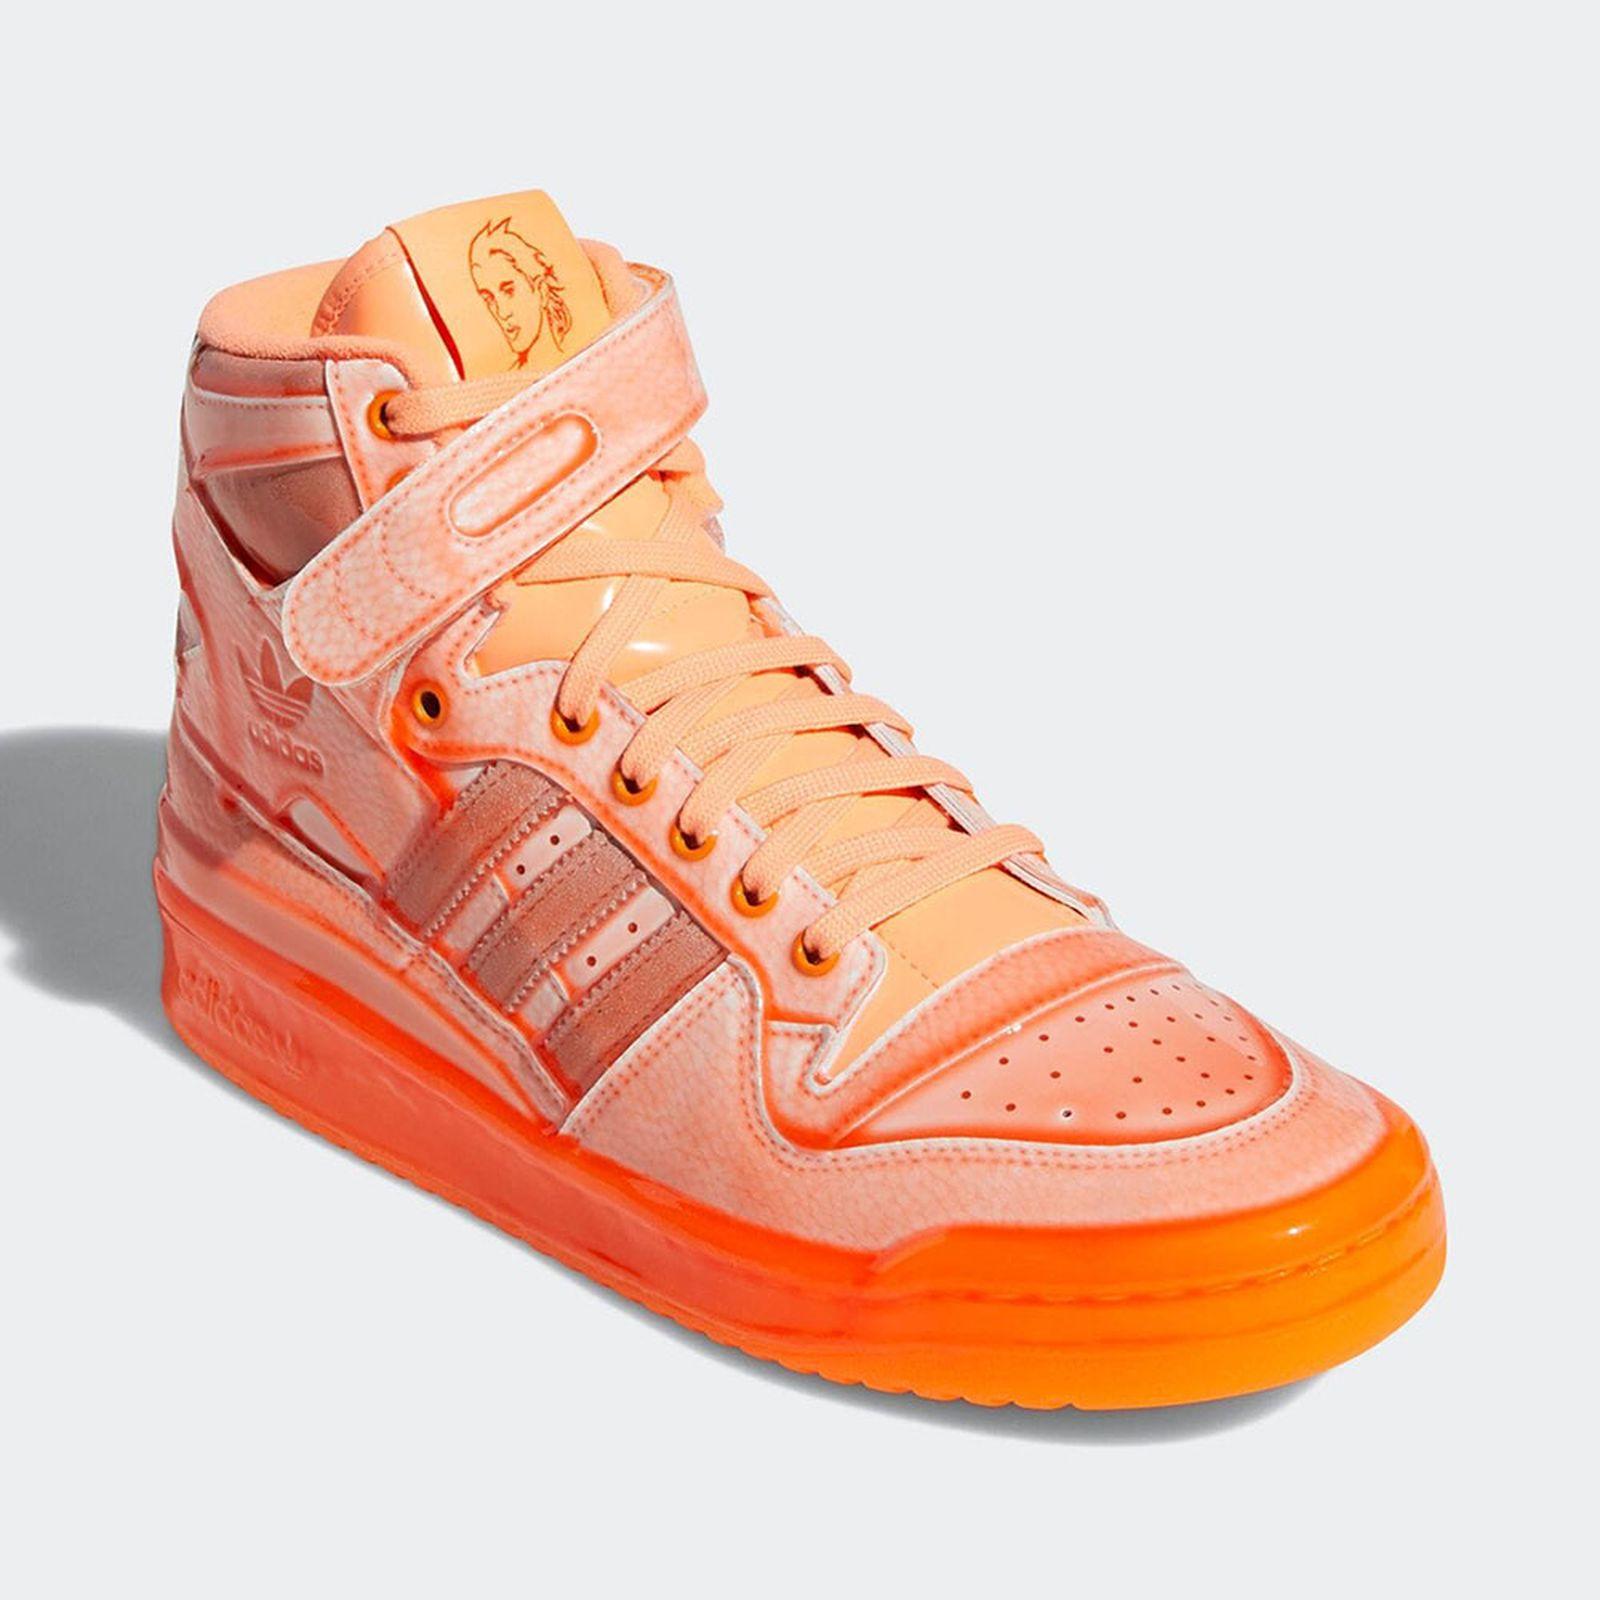 jeremy-scott-adidas-forum-hi-release-date-price-09